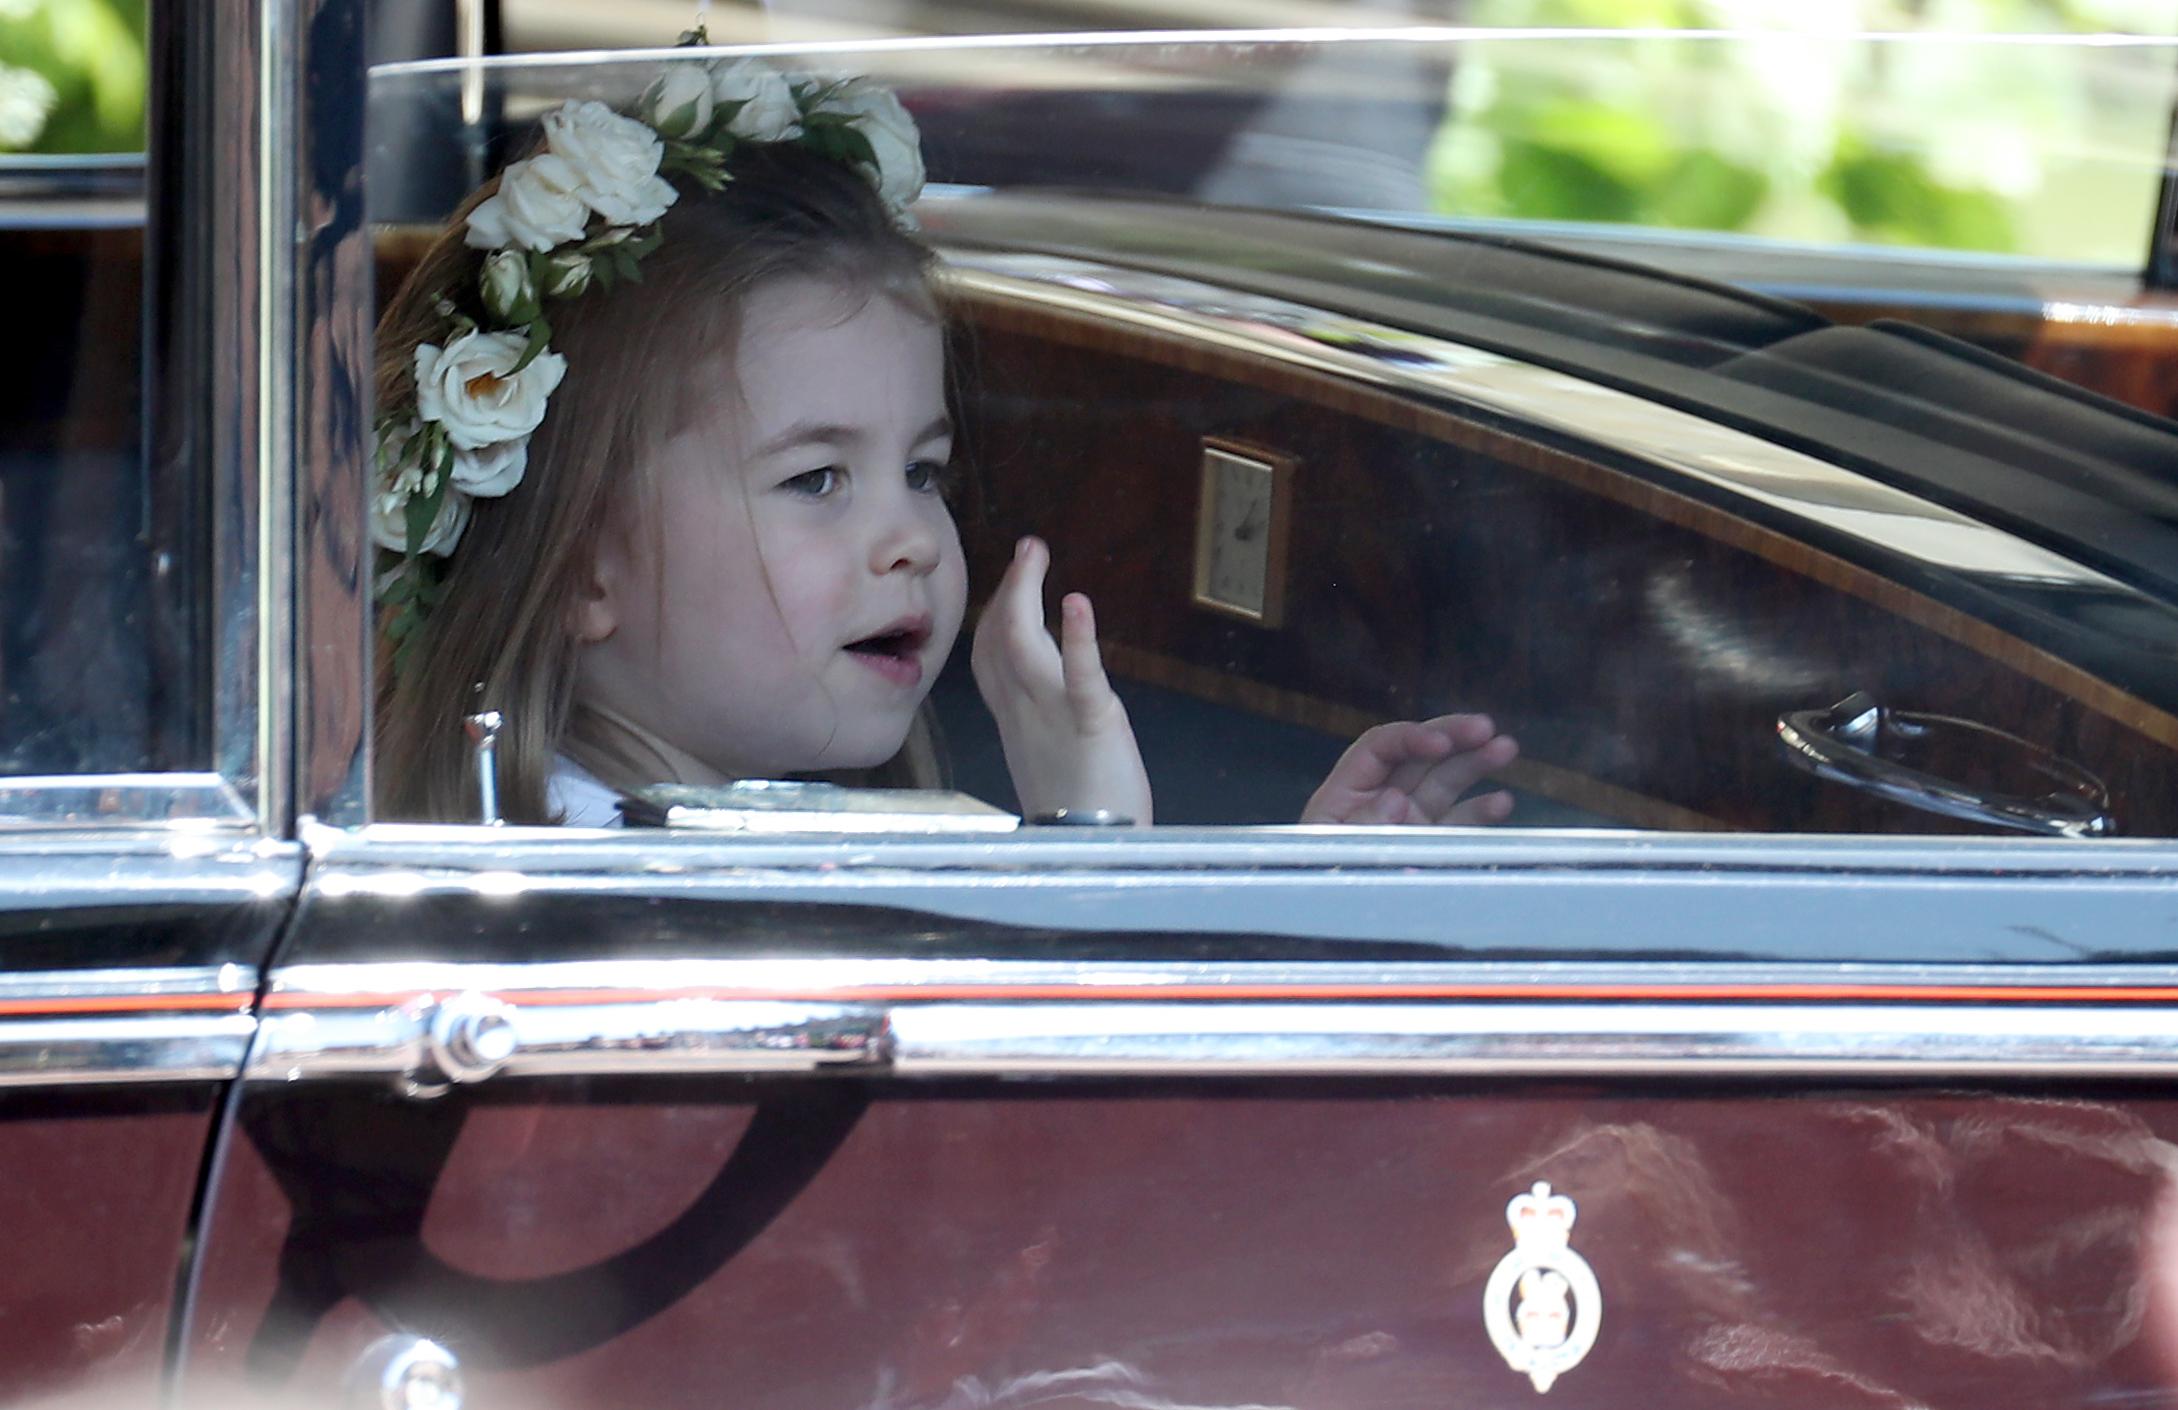 prince-harry-marries-ms-meghan-markle-windsor-castle-21